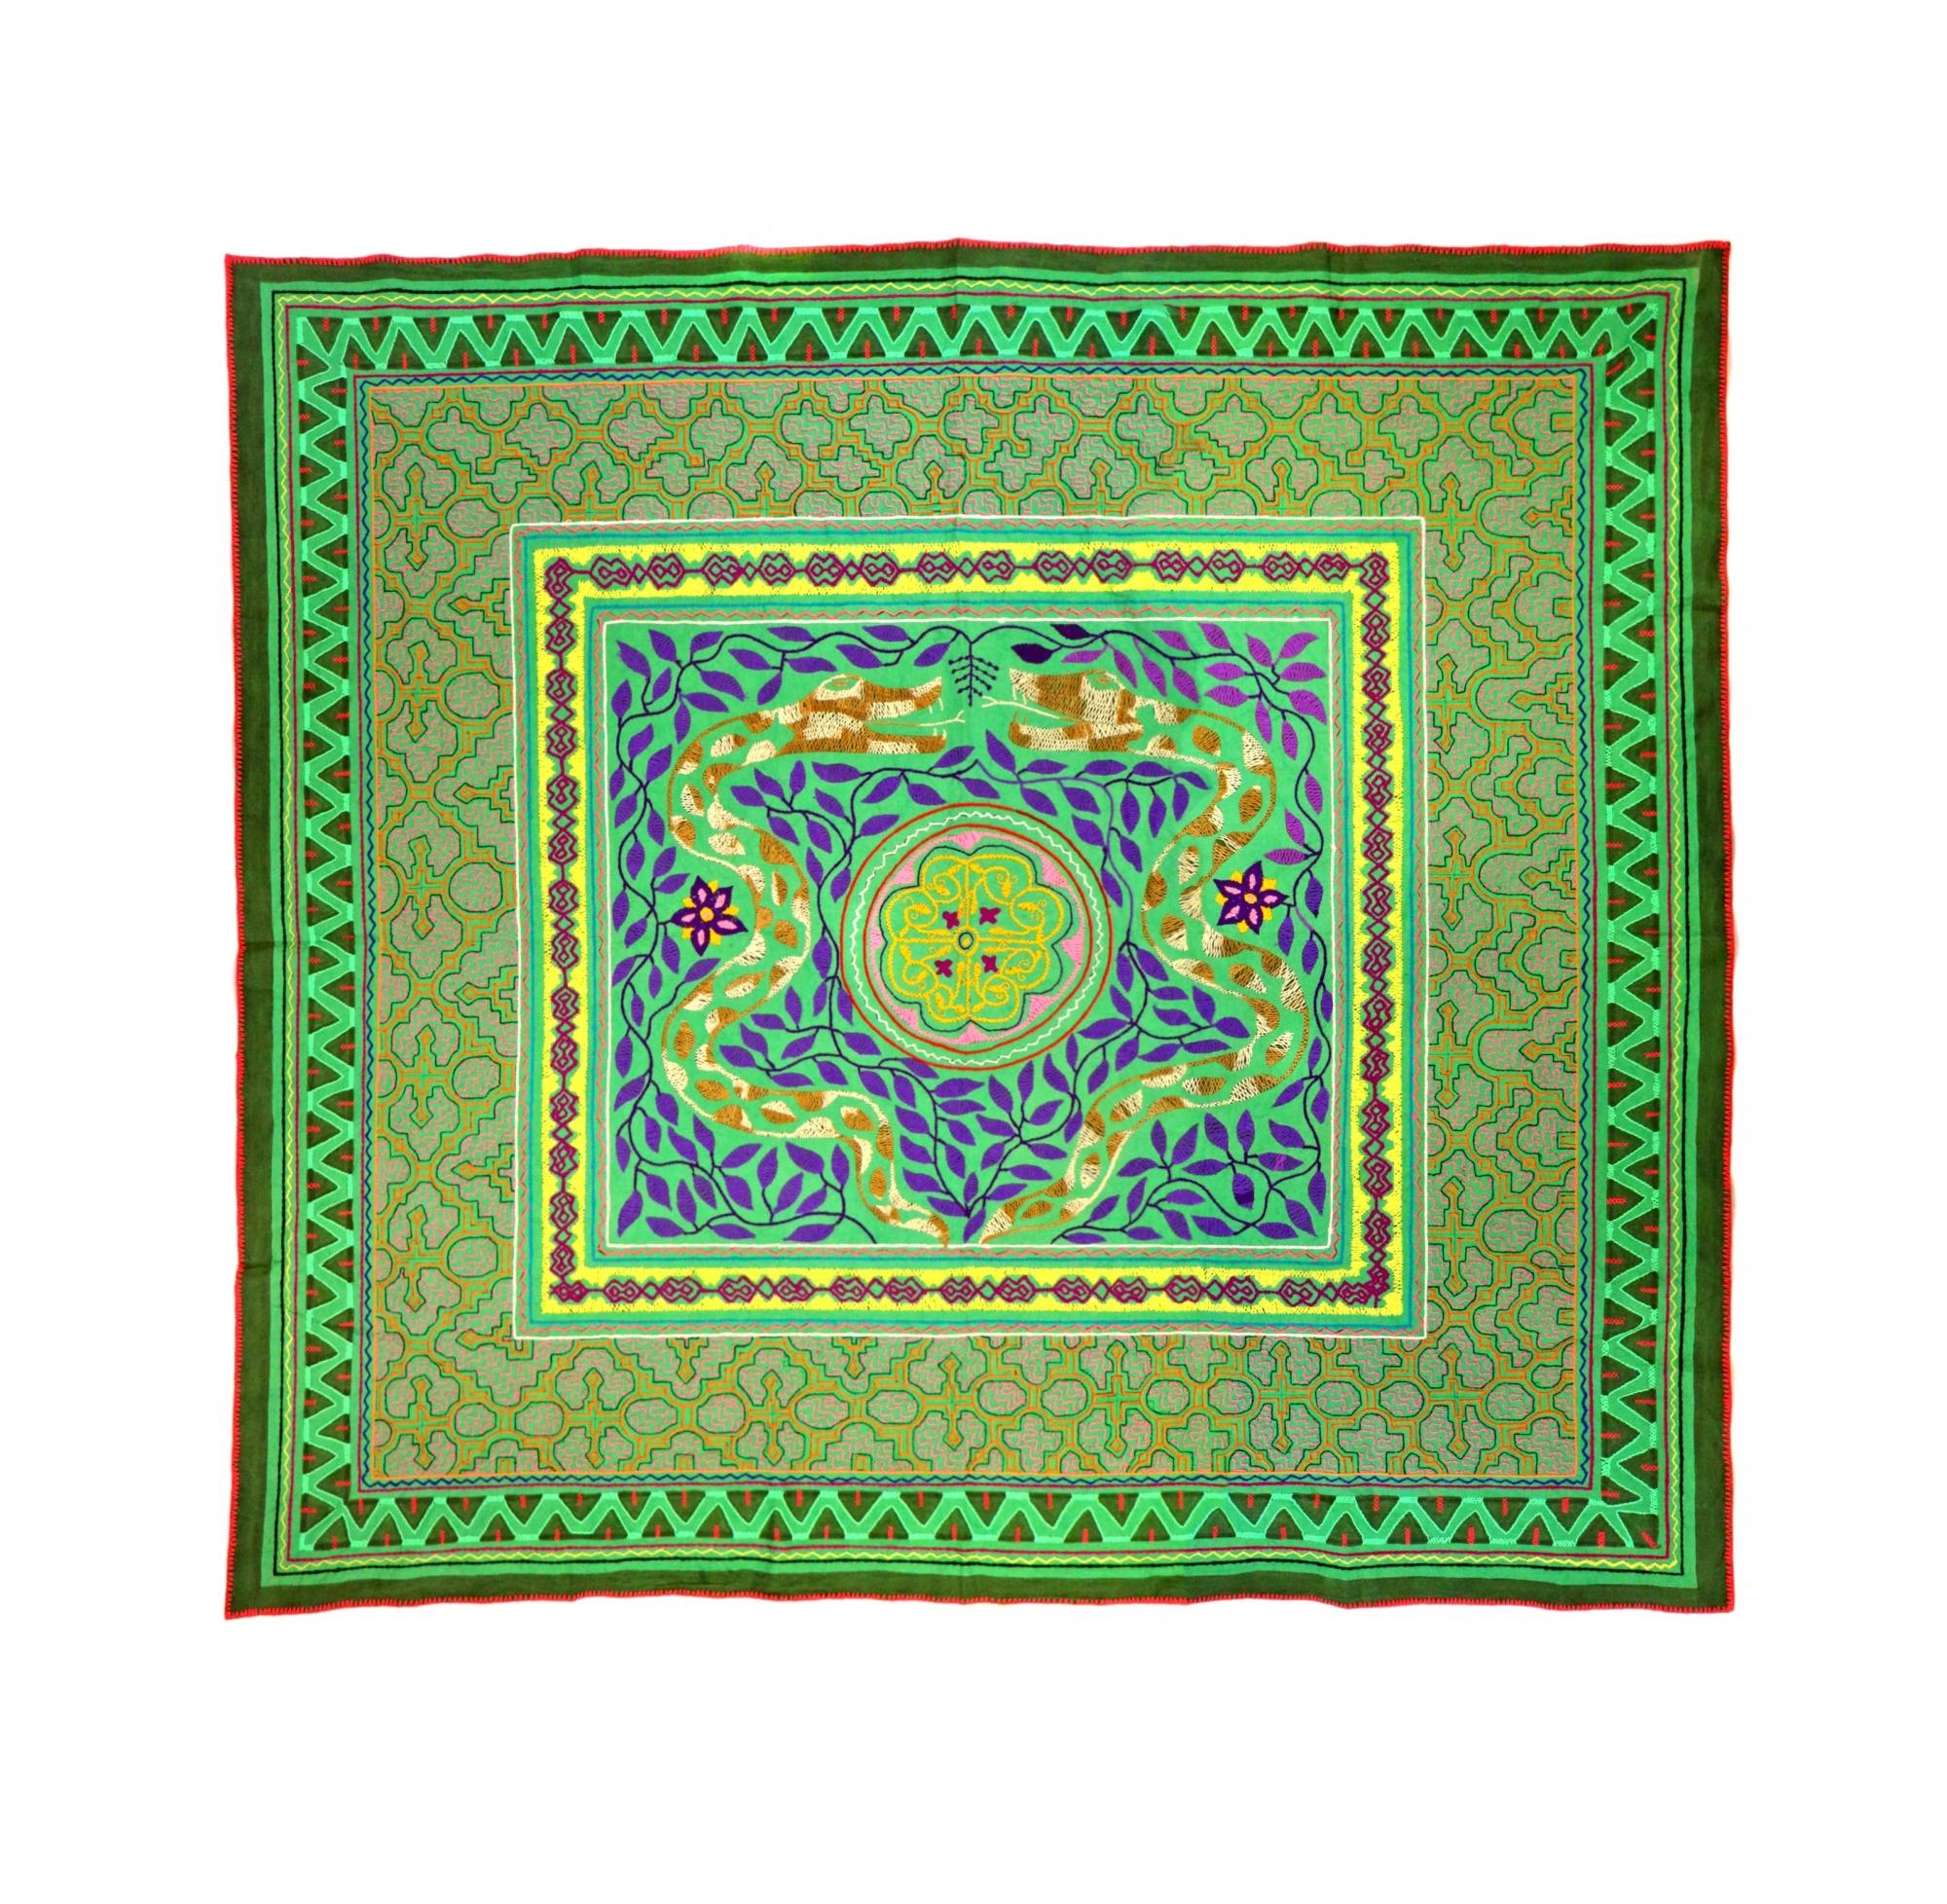 Textil bordado